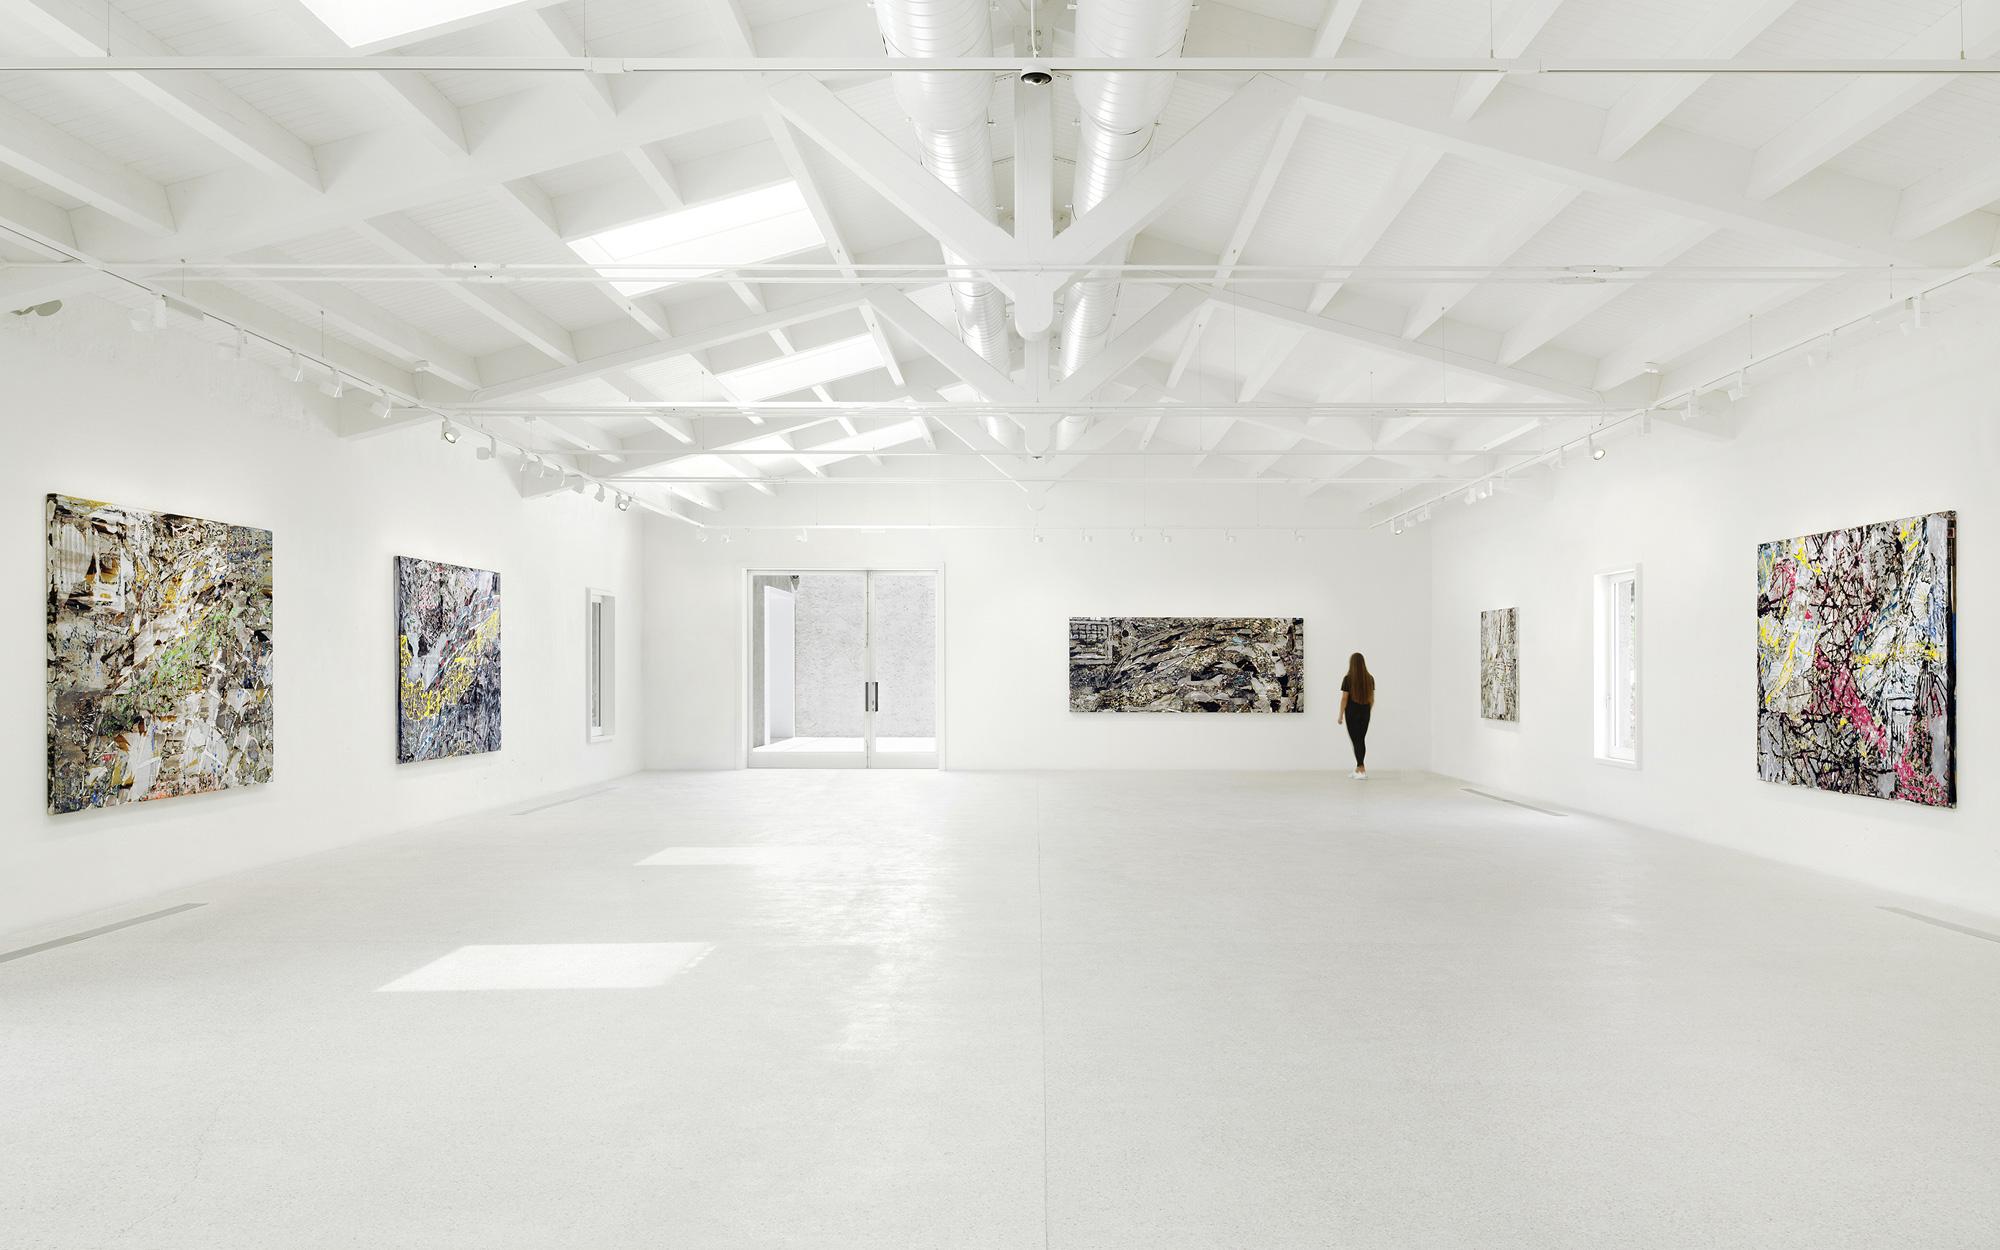 Installation view, 'Mark Bradford. Masses and Movements' at Hauser & Wirth Menorca, until 31 October 2021 © Mark Bradford Courtesy the artist and Hauser & Wirth © Stefan Altenburger